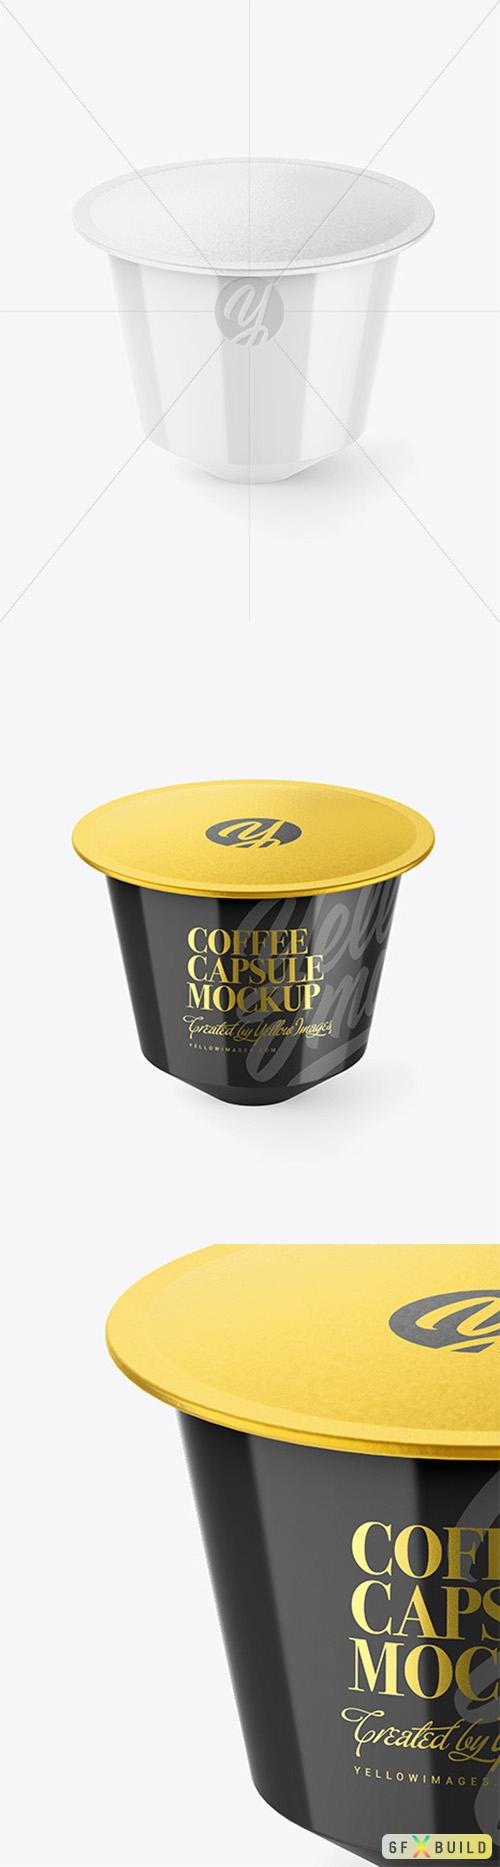 Glossy Coffee Capsule Mockup 62893 TIF